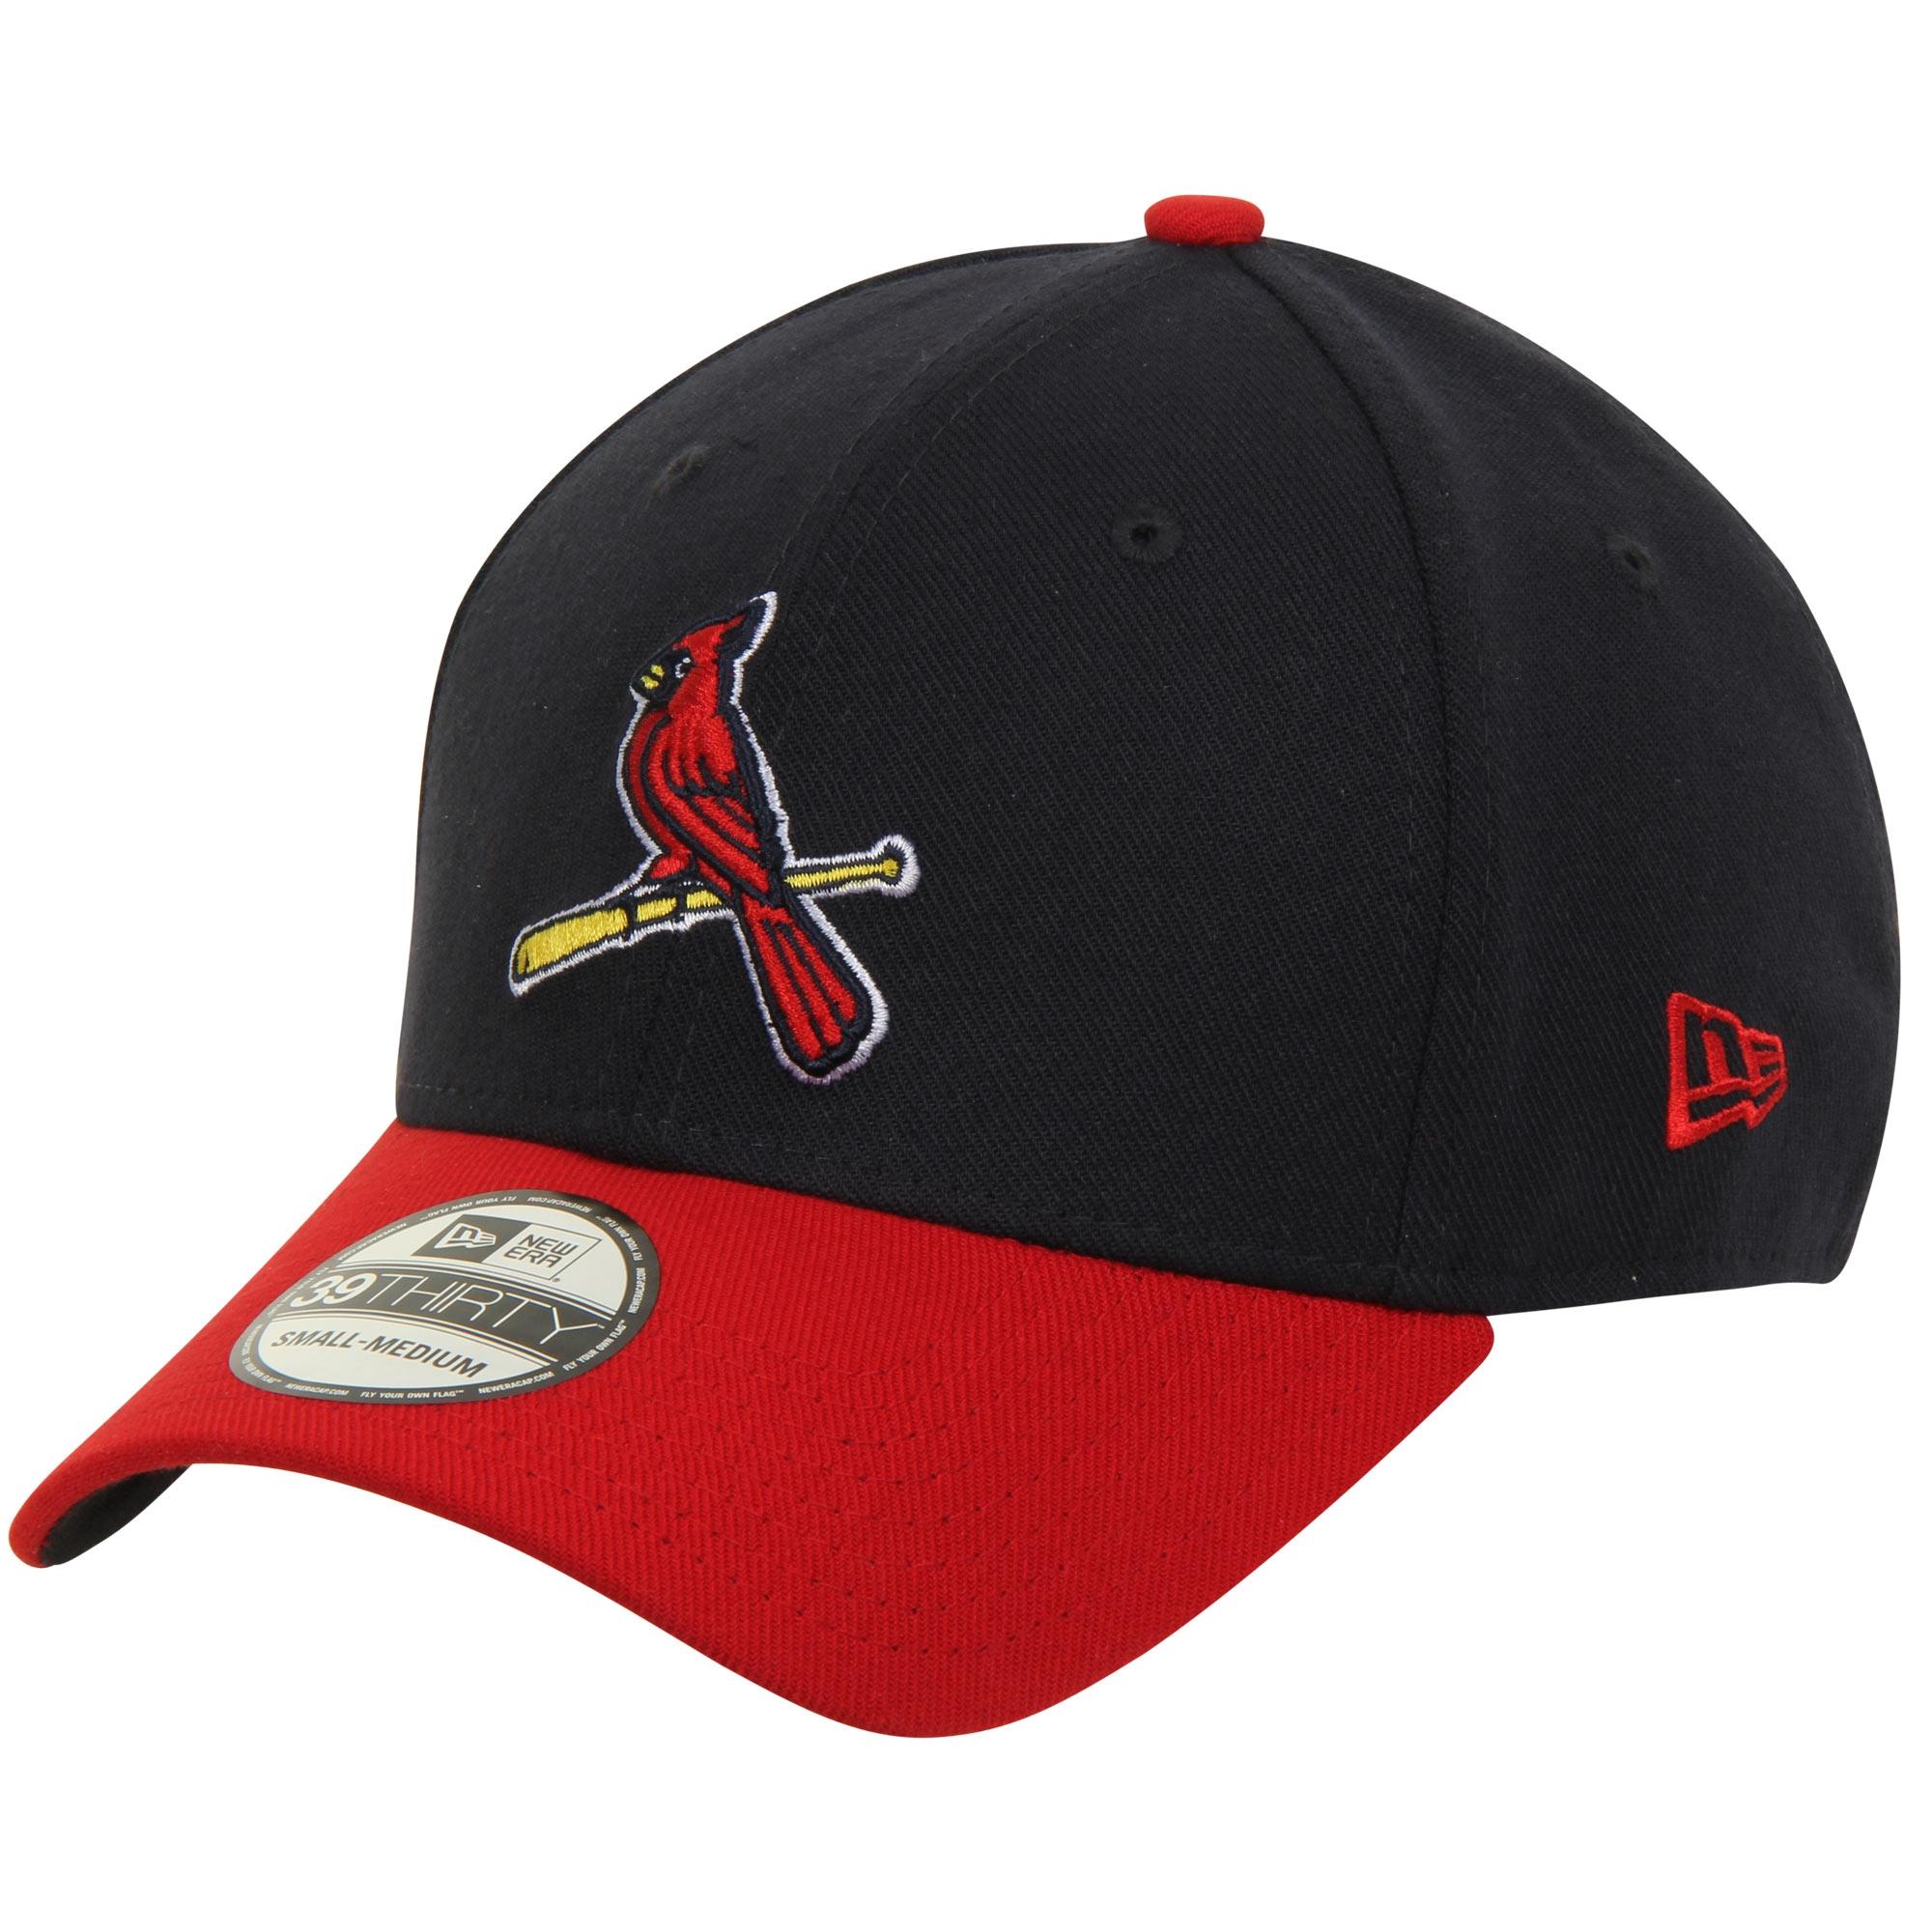 00010e344 St. Louis Cardinals New Era MLB Team Classic Alternate 39THIRTY Flex Hat -  Navy/Red